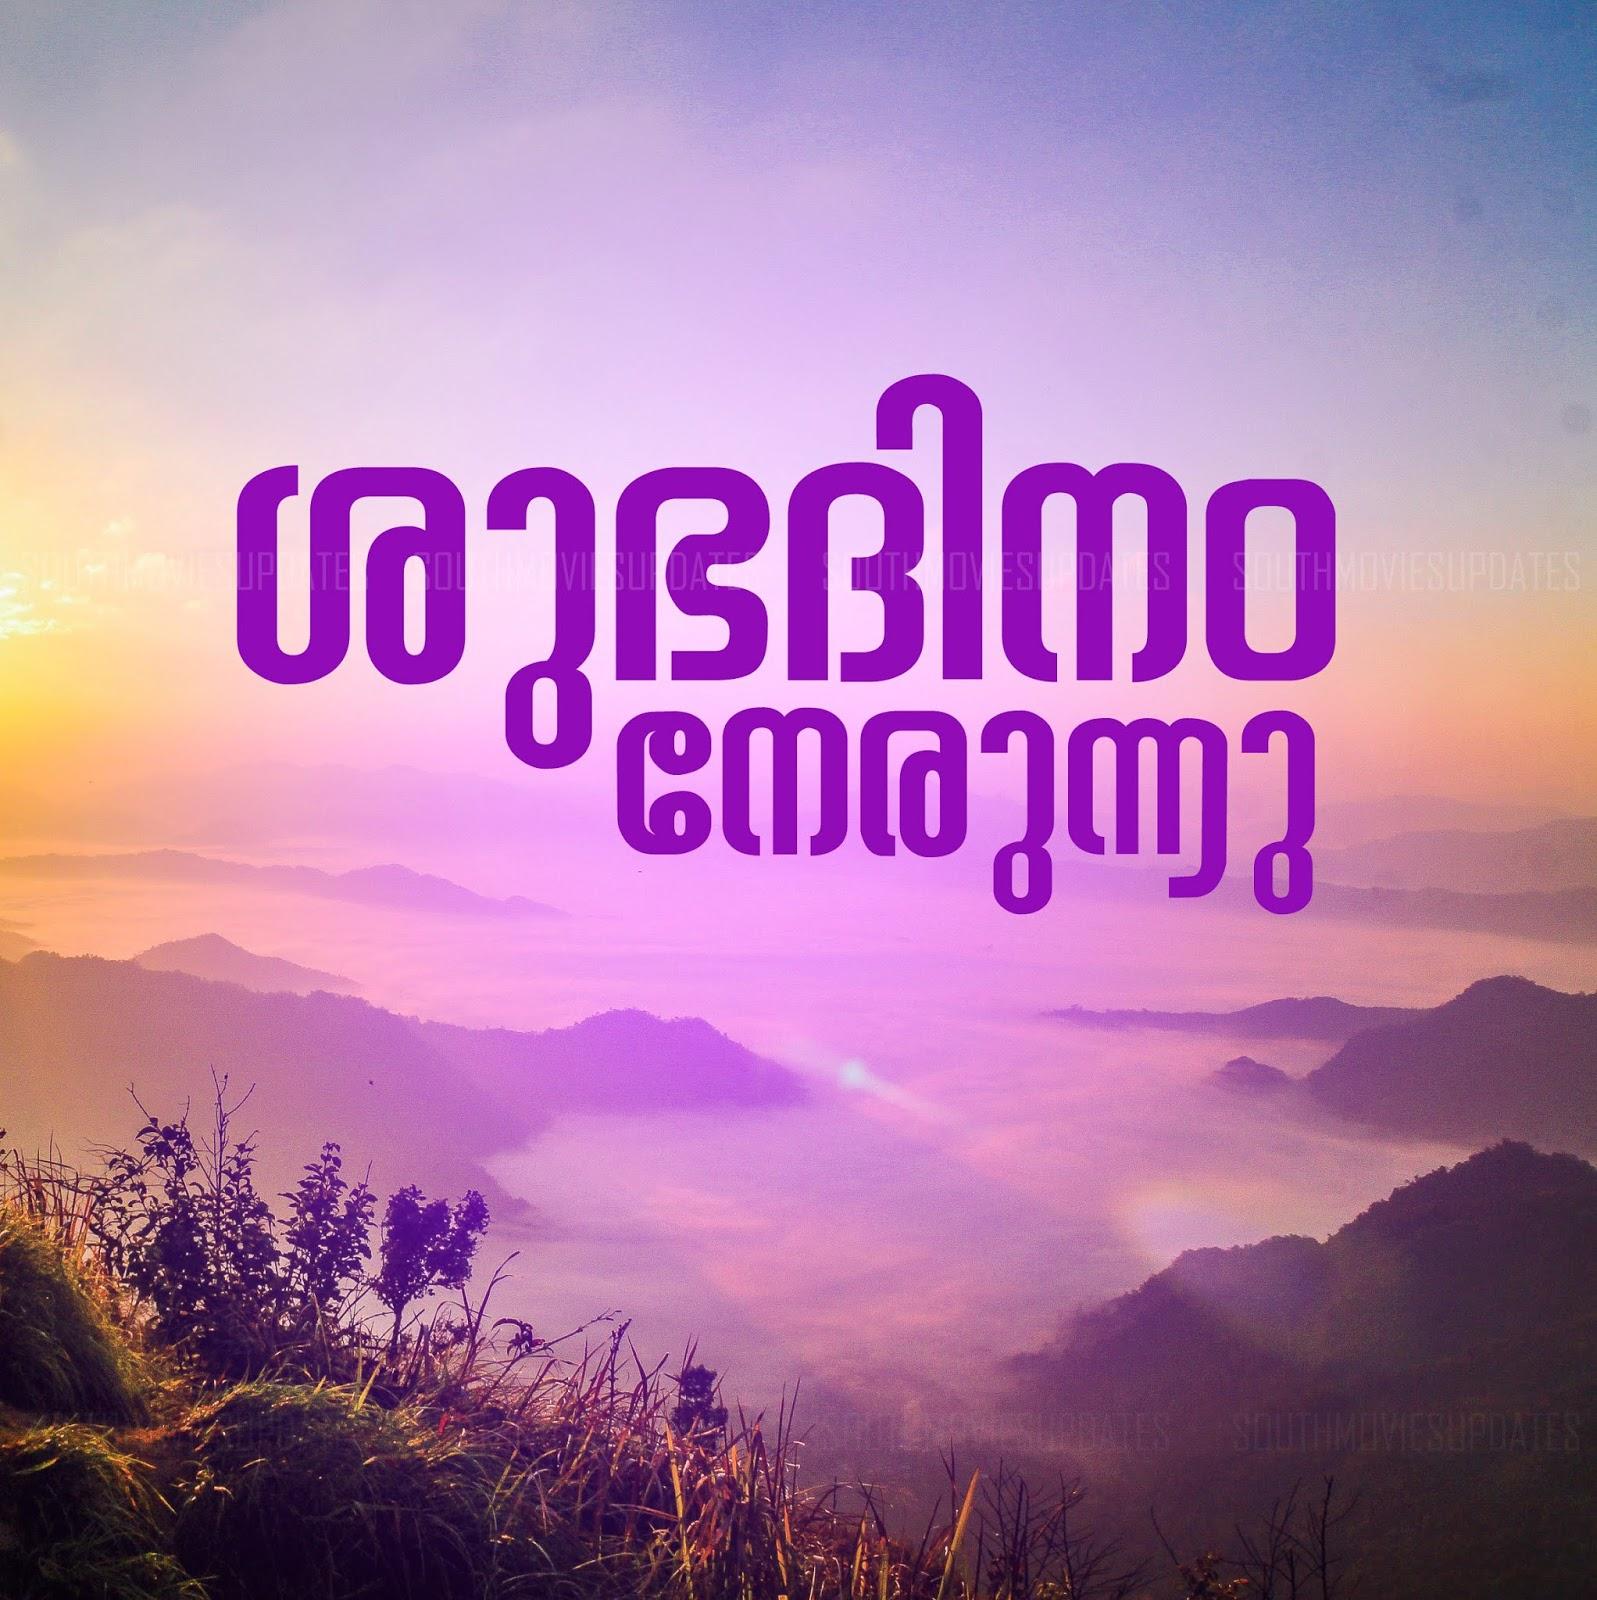 Beautiful Malayalam Good Morning And Good Night Wishes South